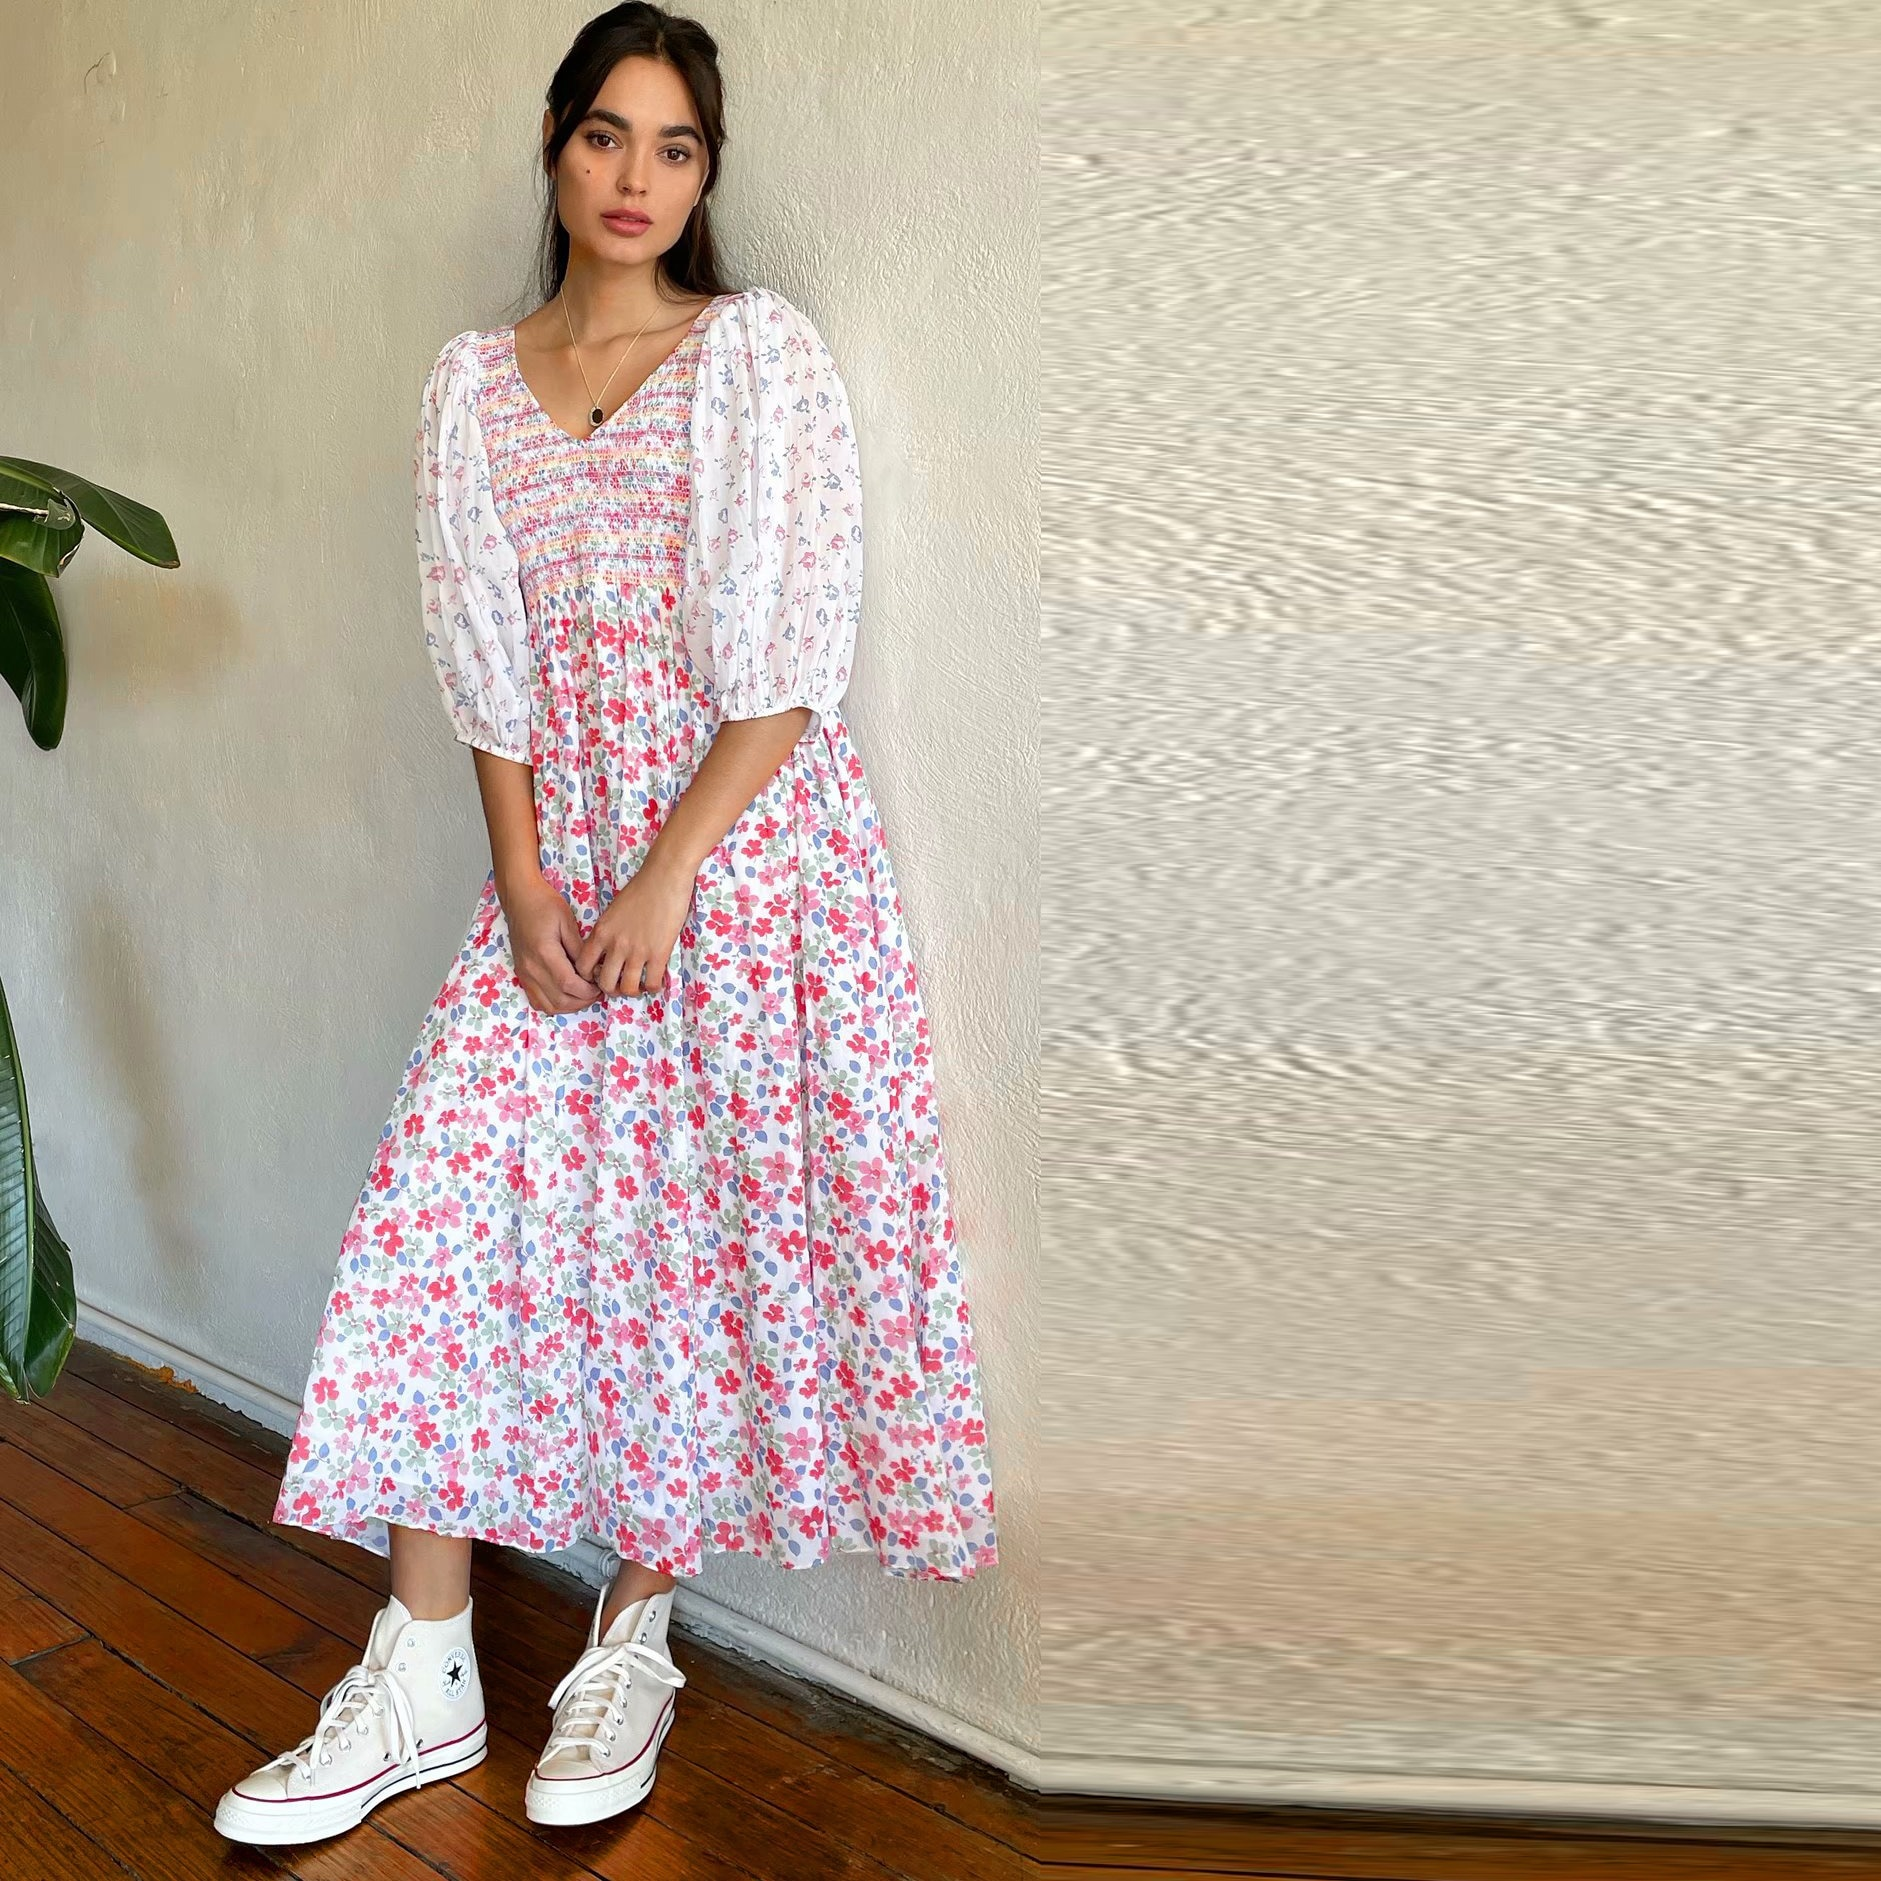 Beachapche ربيع المرأة خمر المرقعة الأزهار طباعة فستان مناسبات الإناث فانوس كم كبير سوينغ فستان طويل غير رسمي بوهو رداء